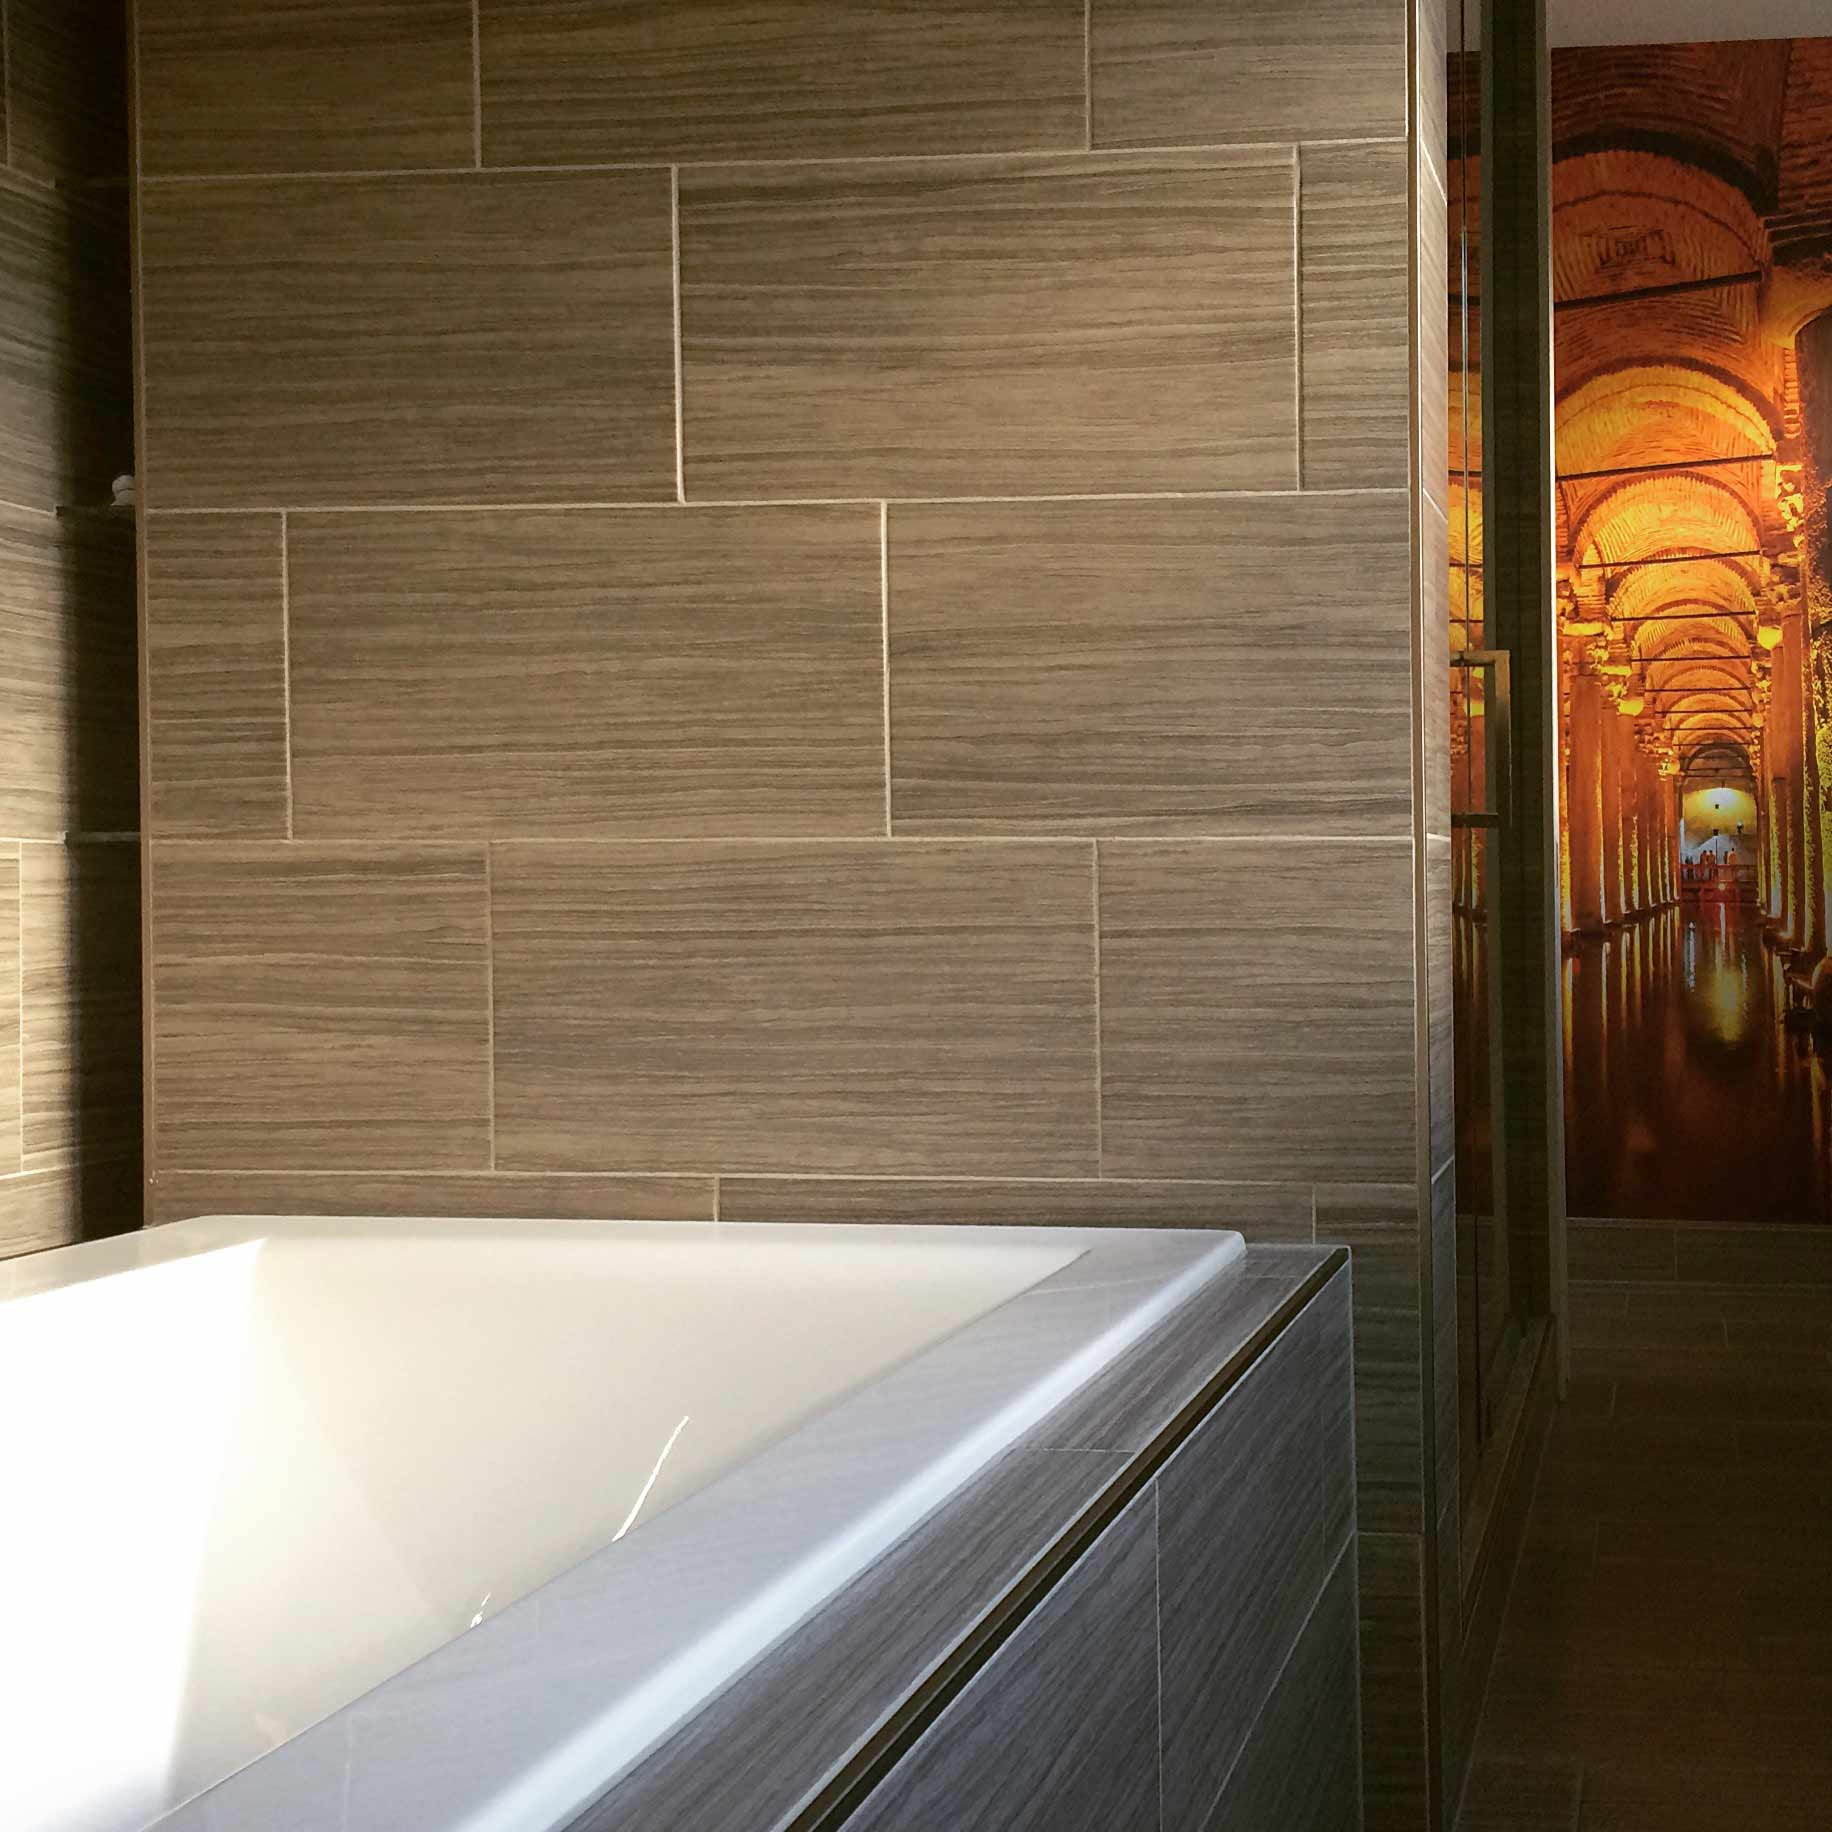 Chatham Arch Brownstone Interior Renovation Complete